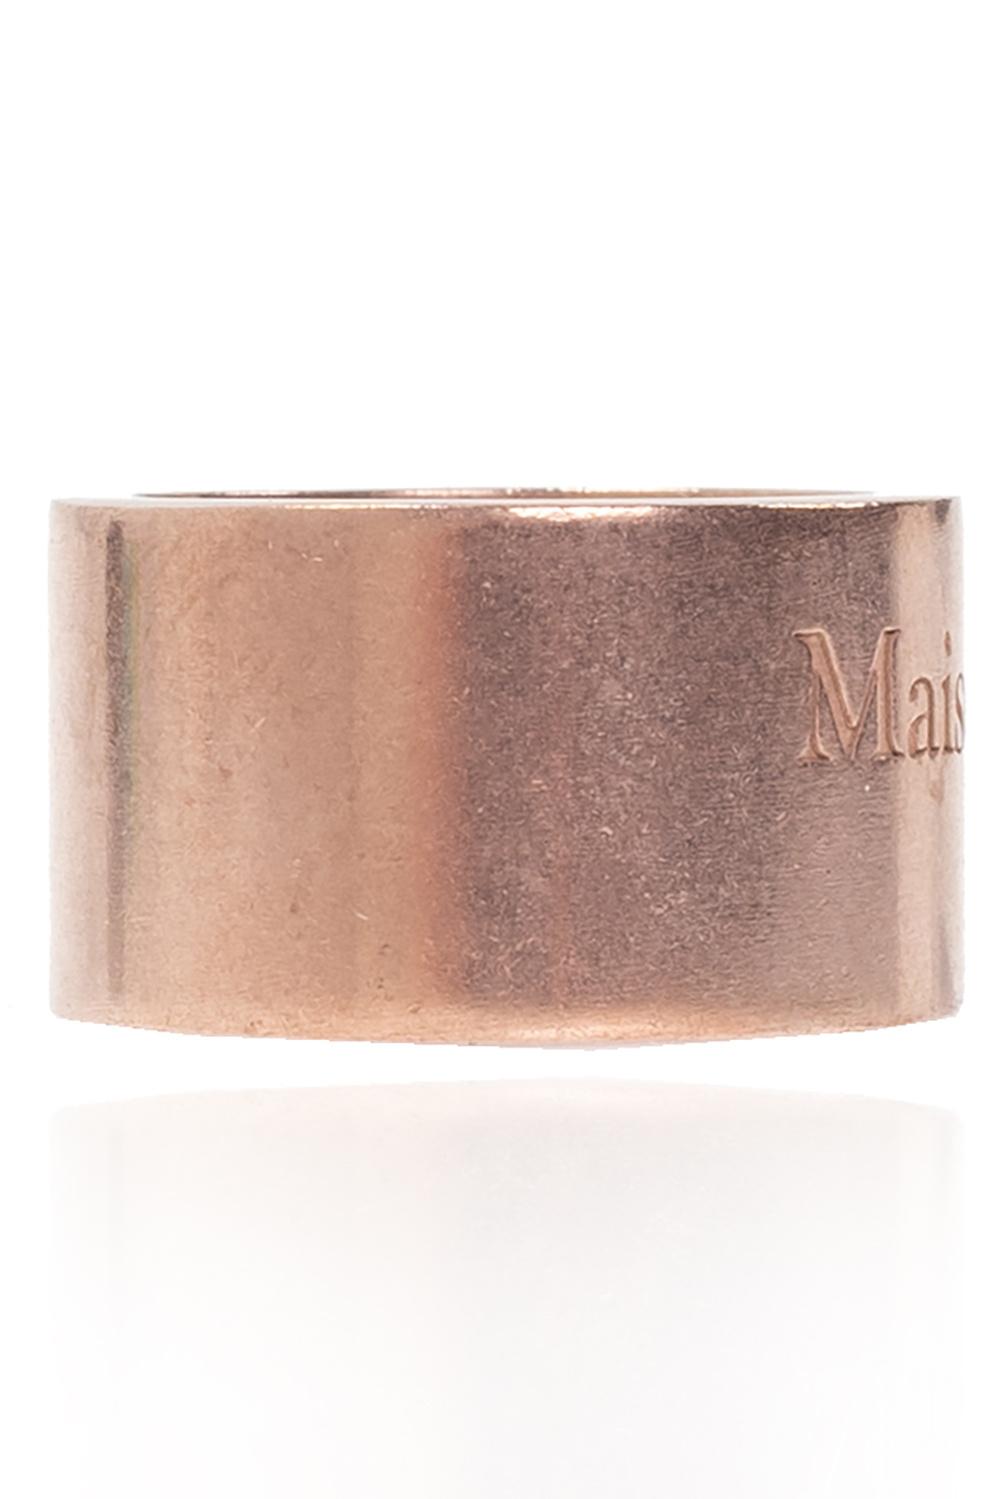 Maison Margiela Silver ring with logo